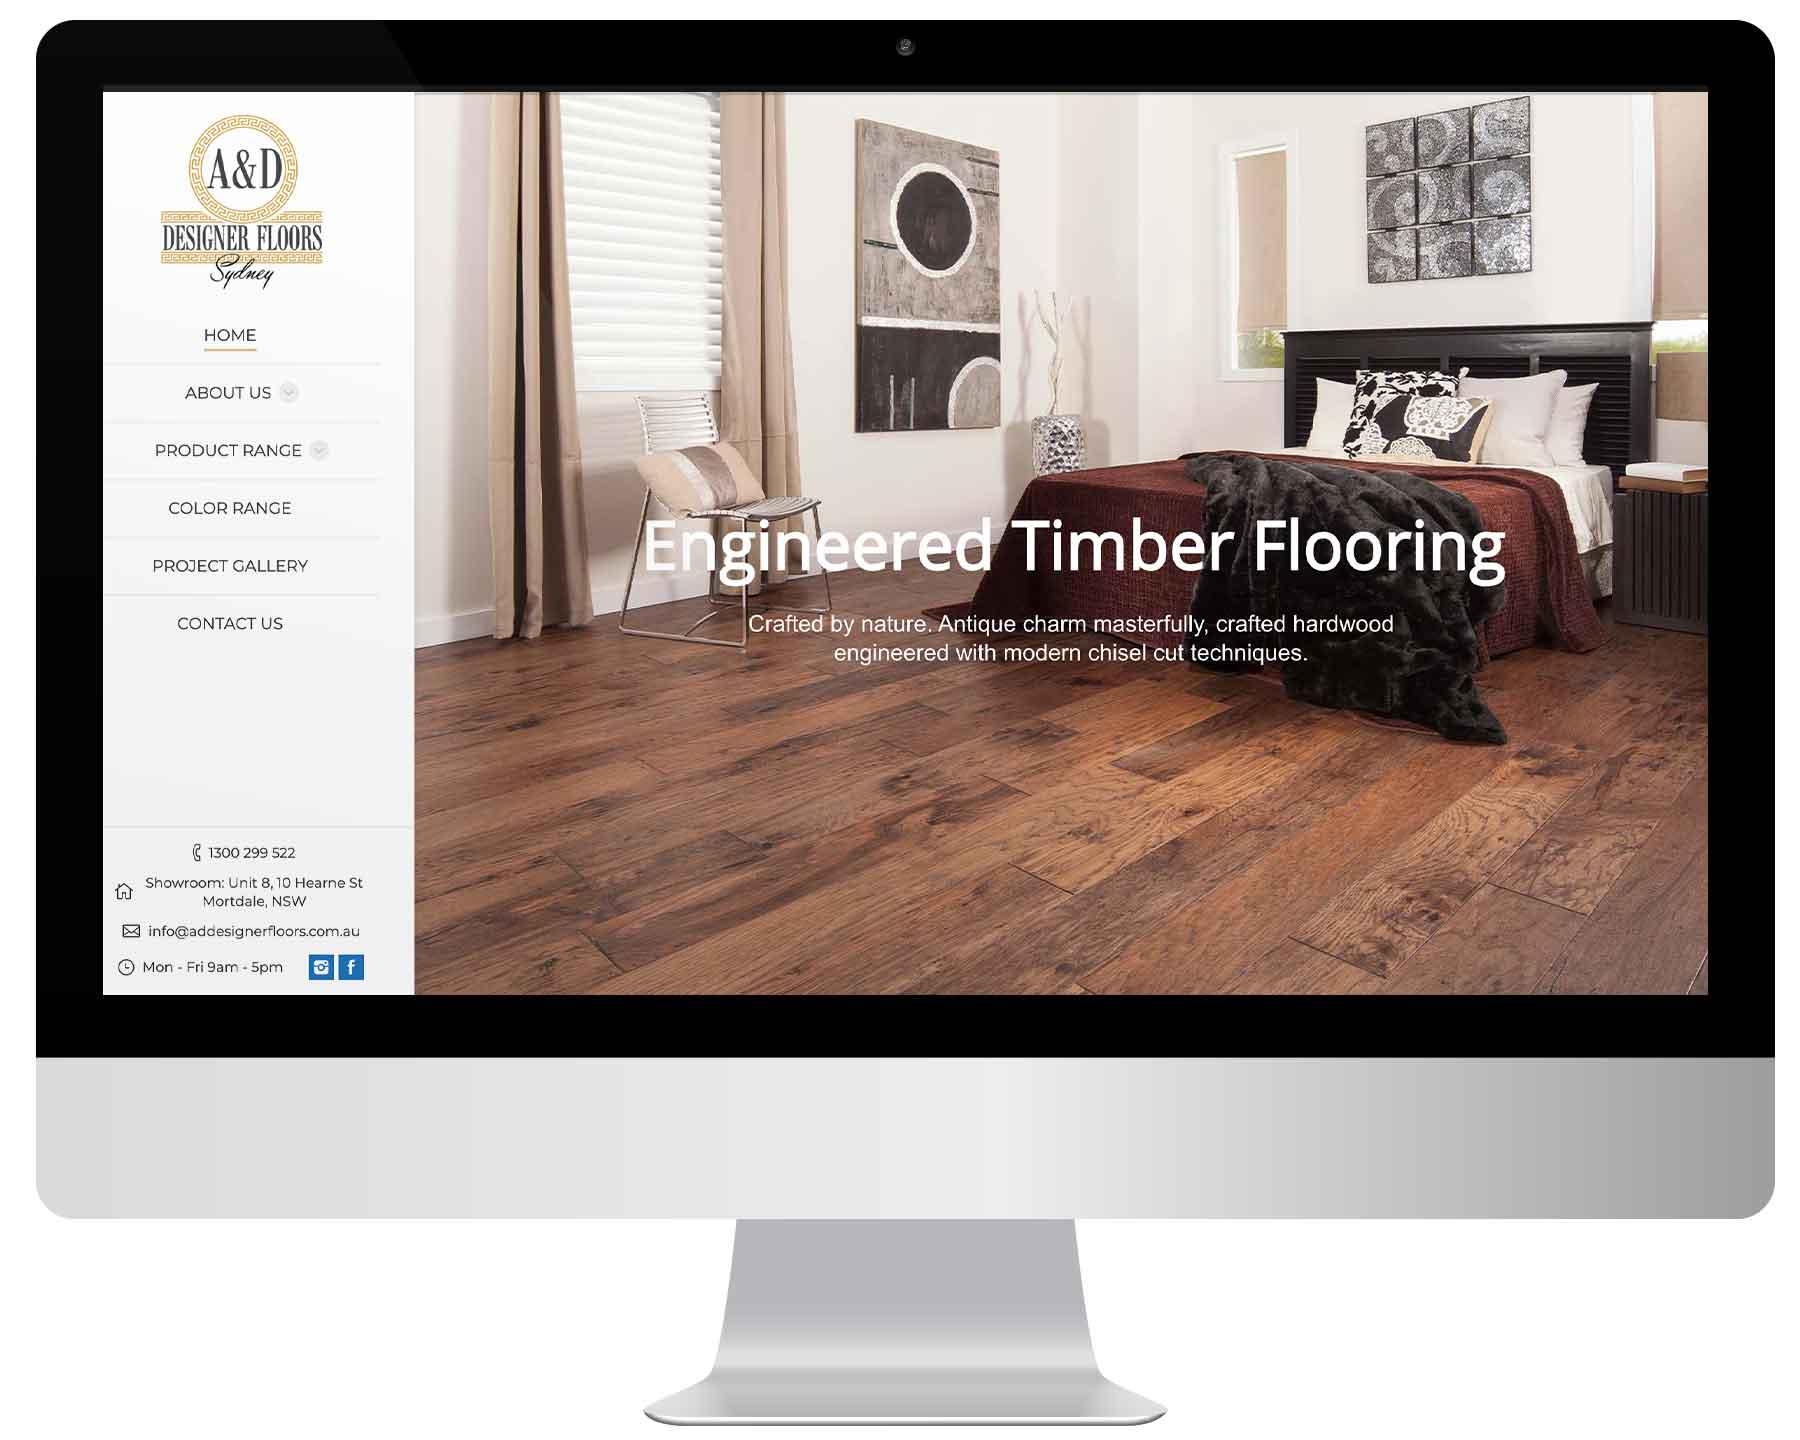 A&D-Designer-Floors-Sydney-iMac